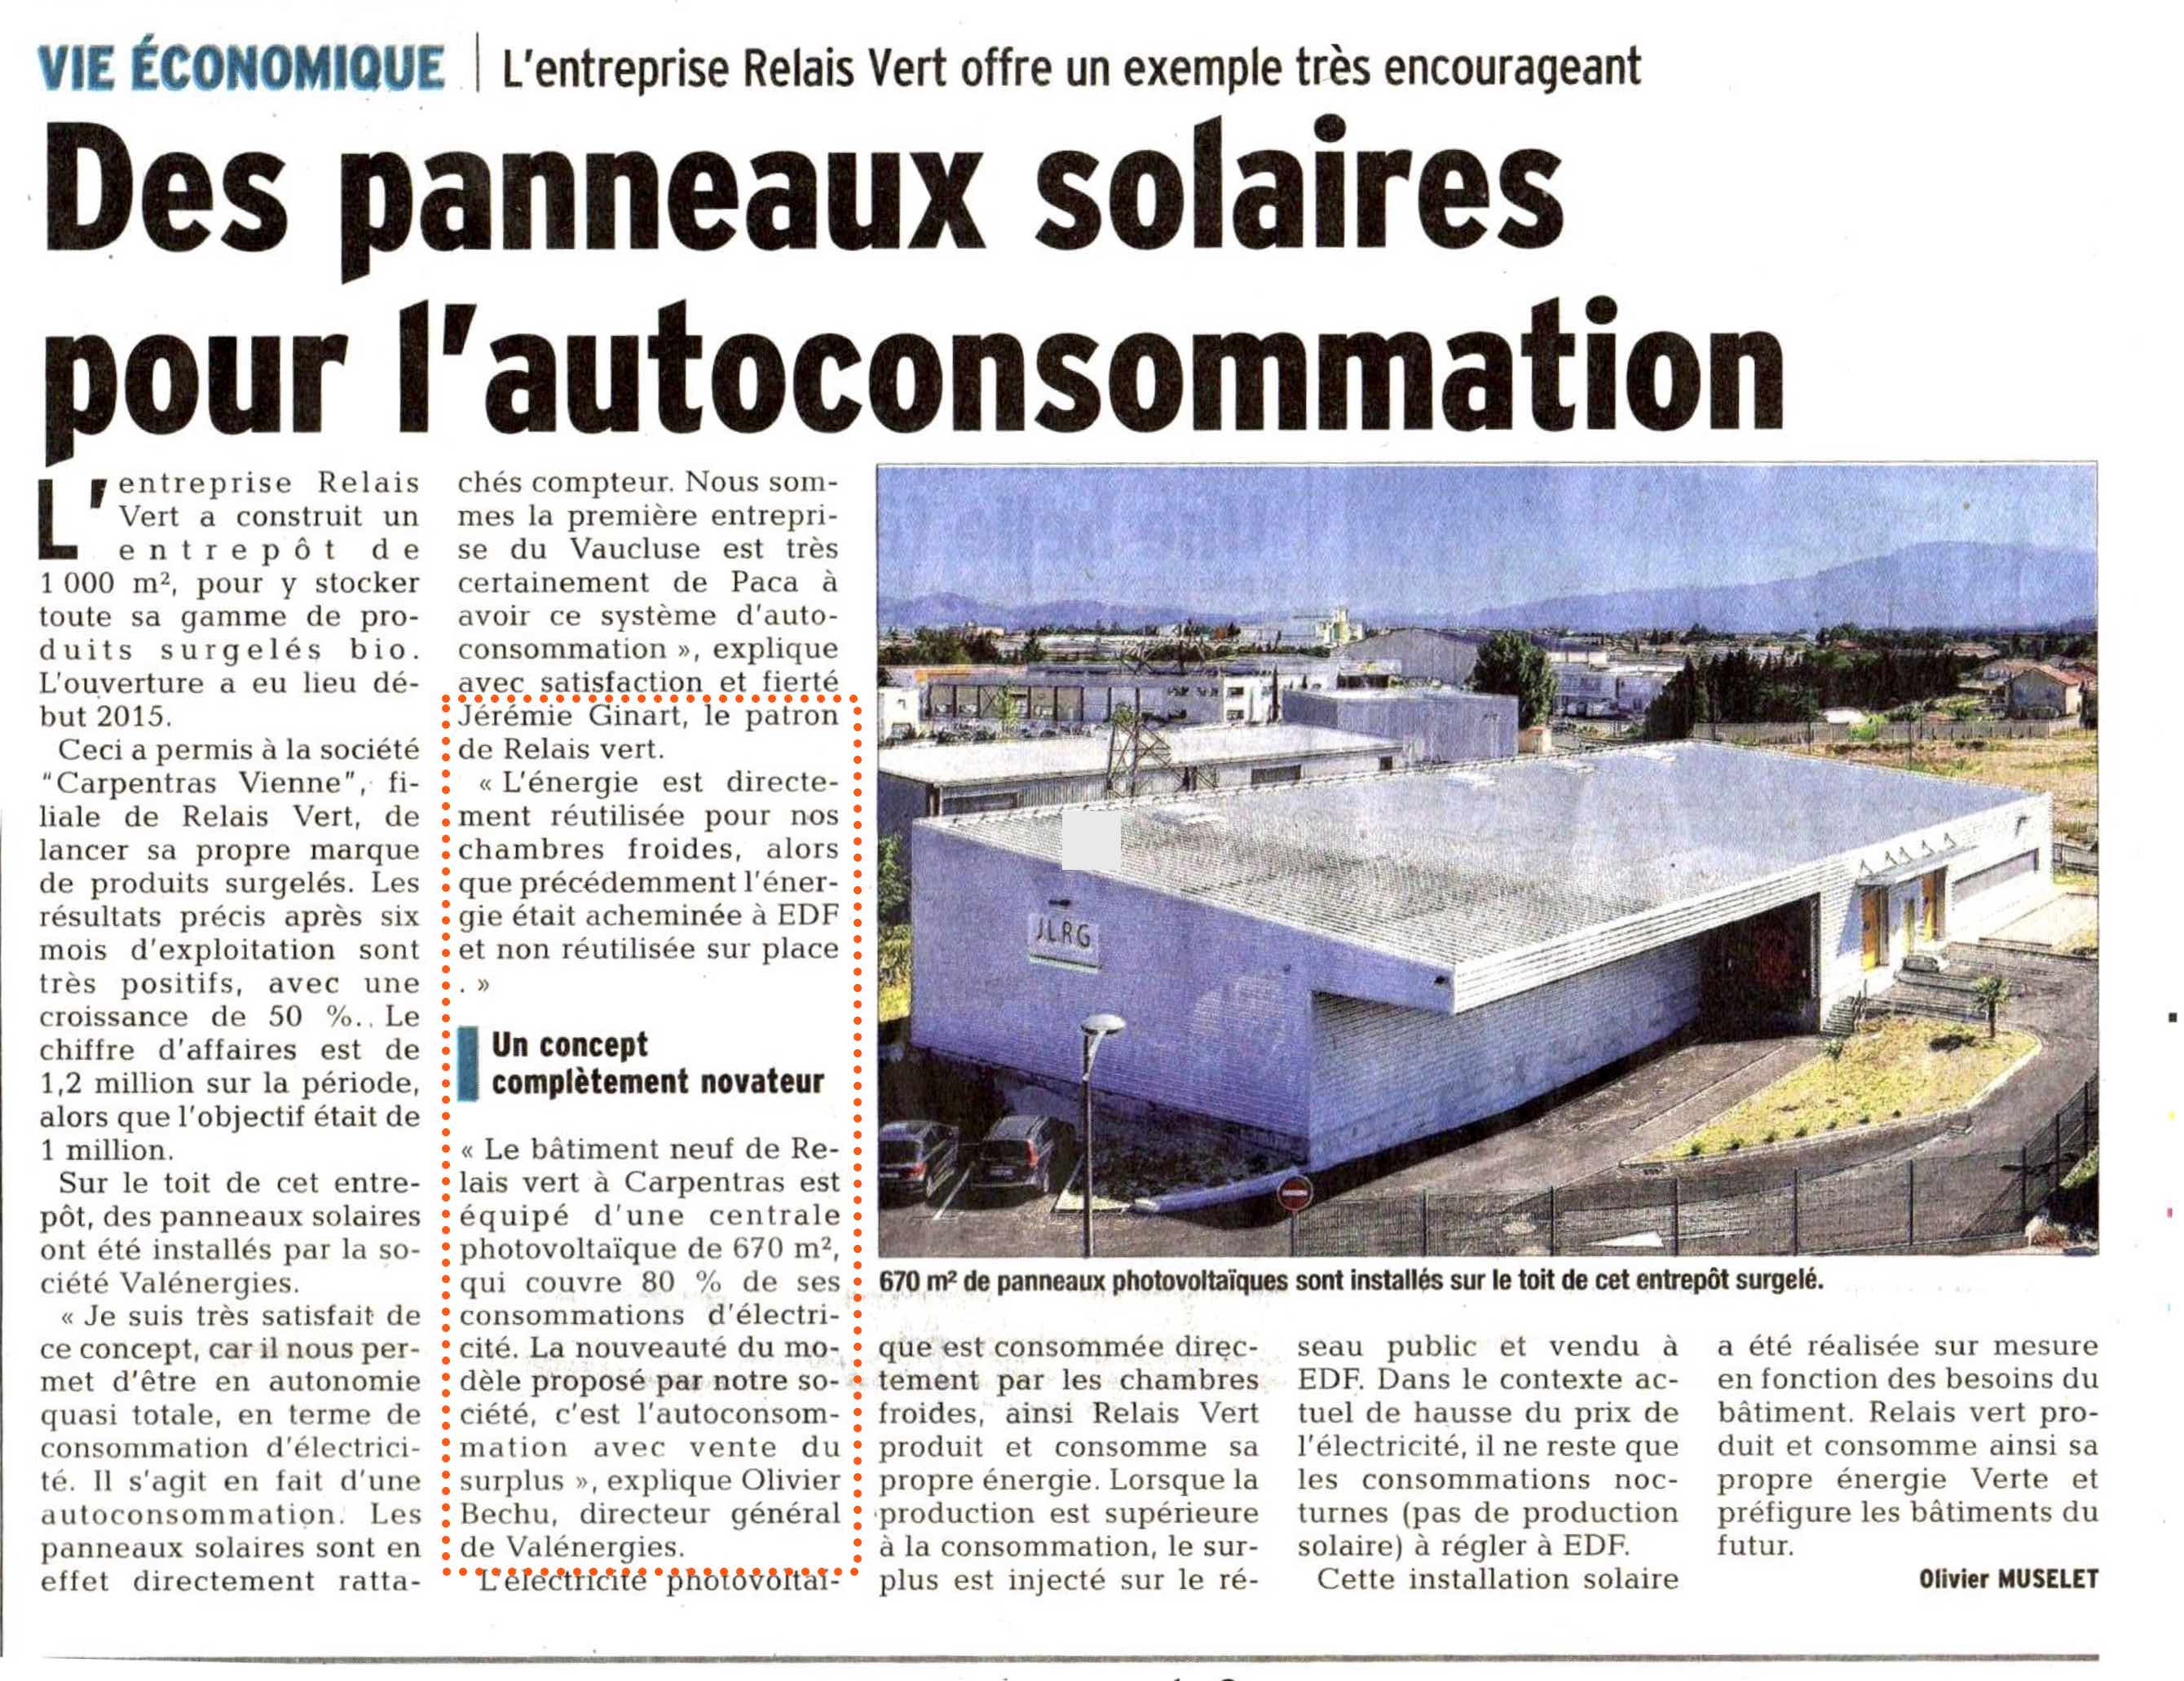 relais-vert-chambres-froides-solaires-photovoltaiques